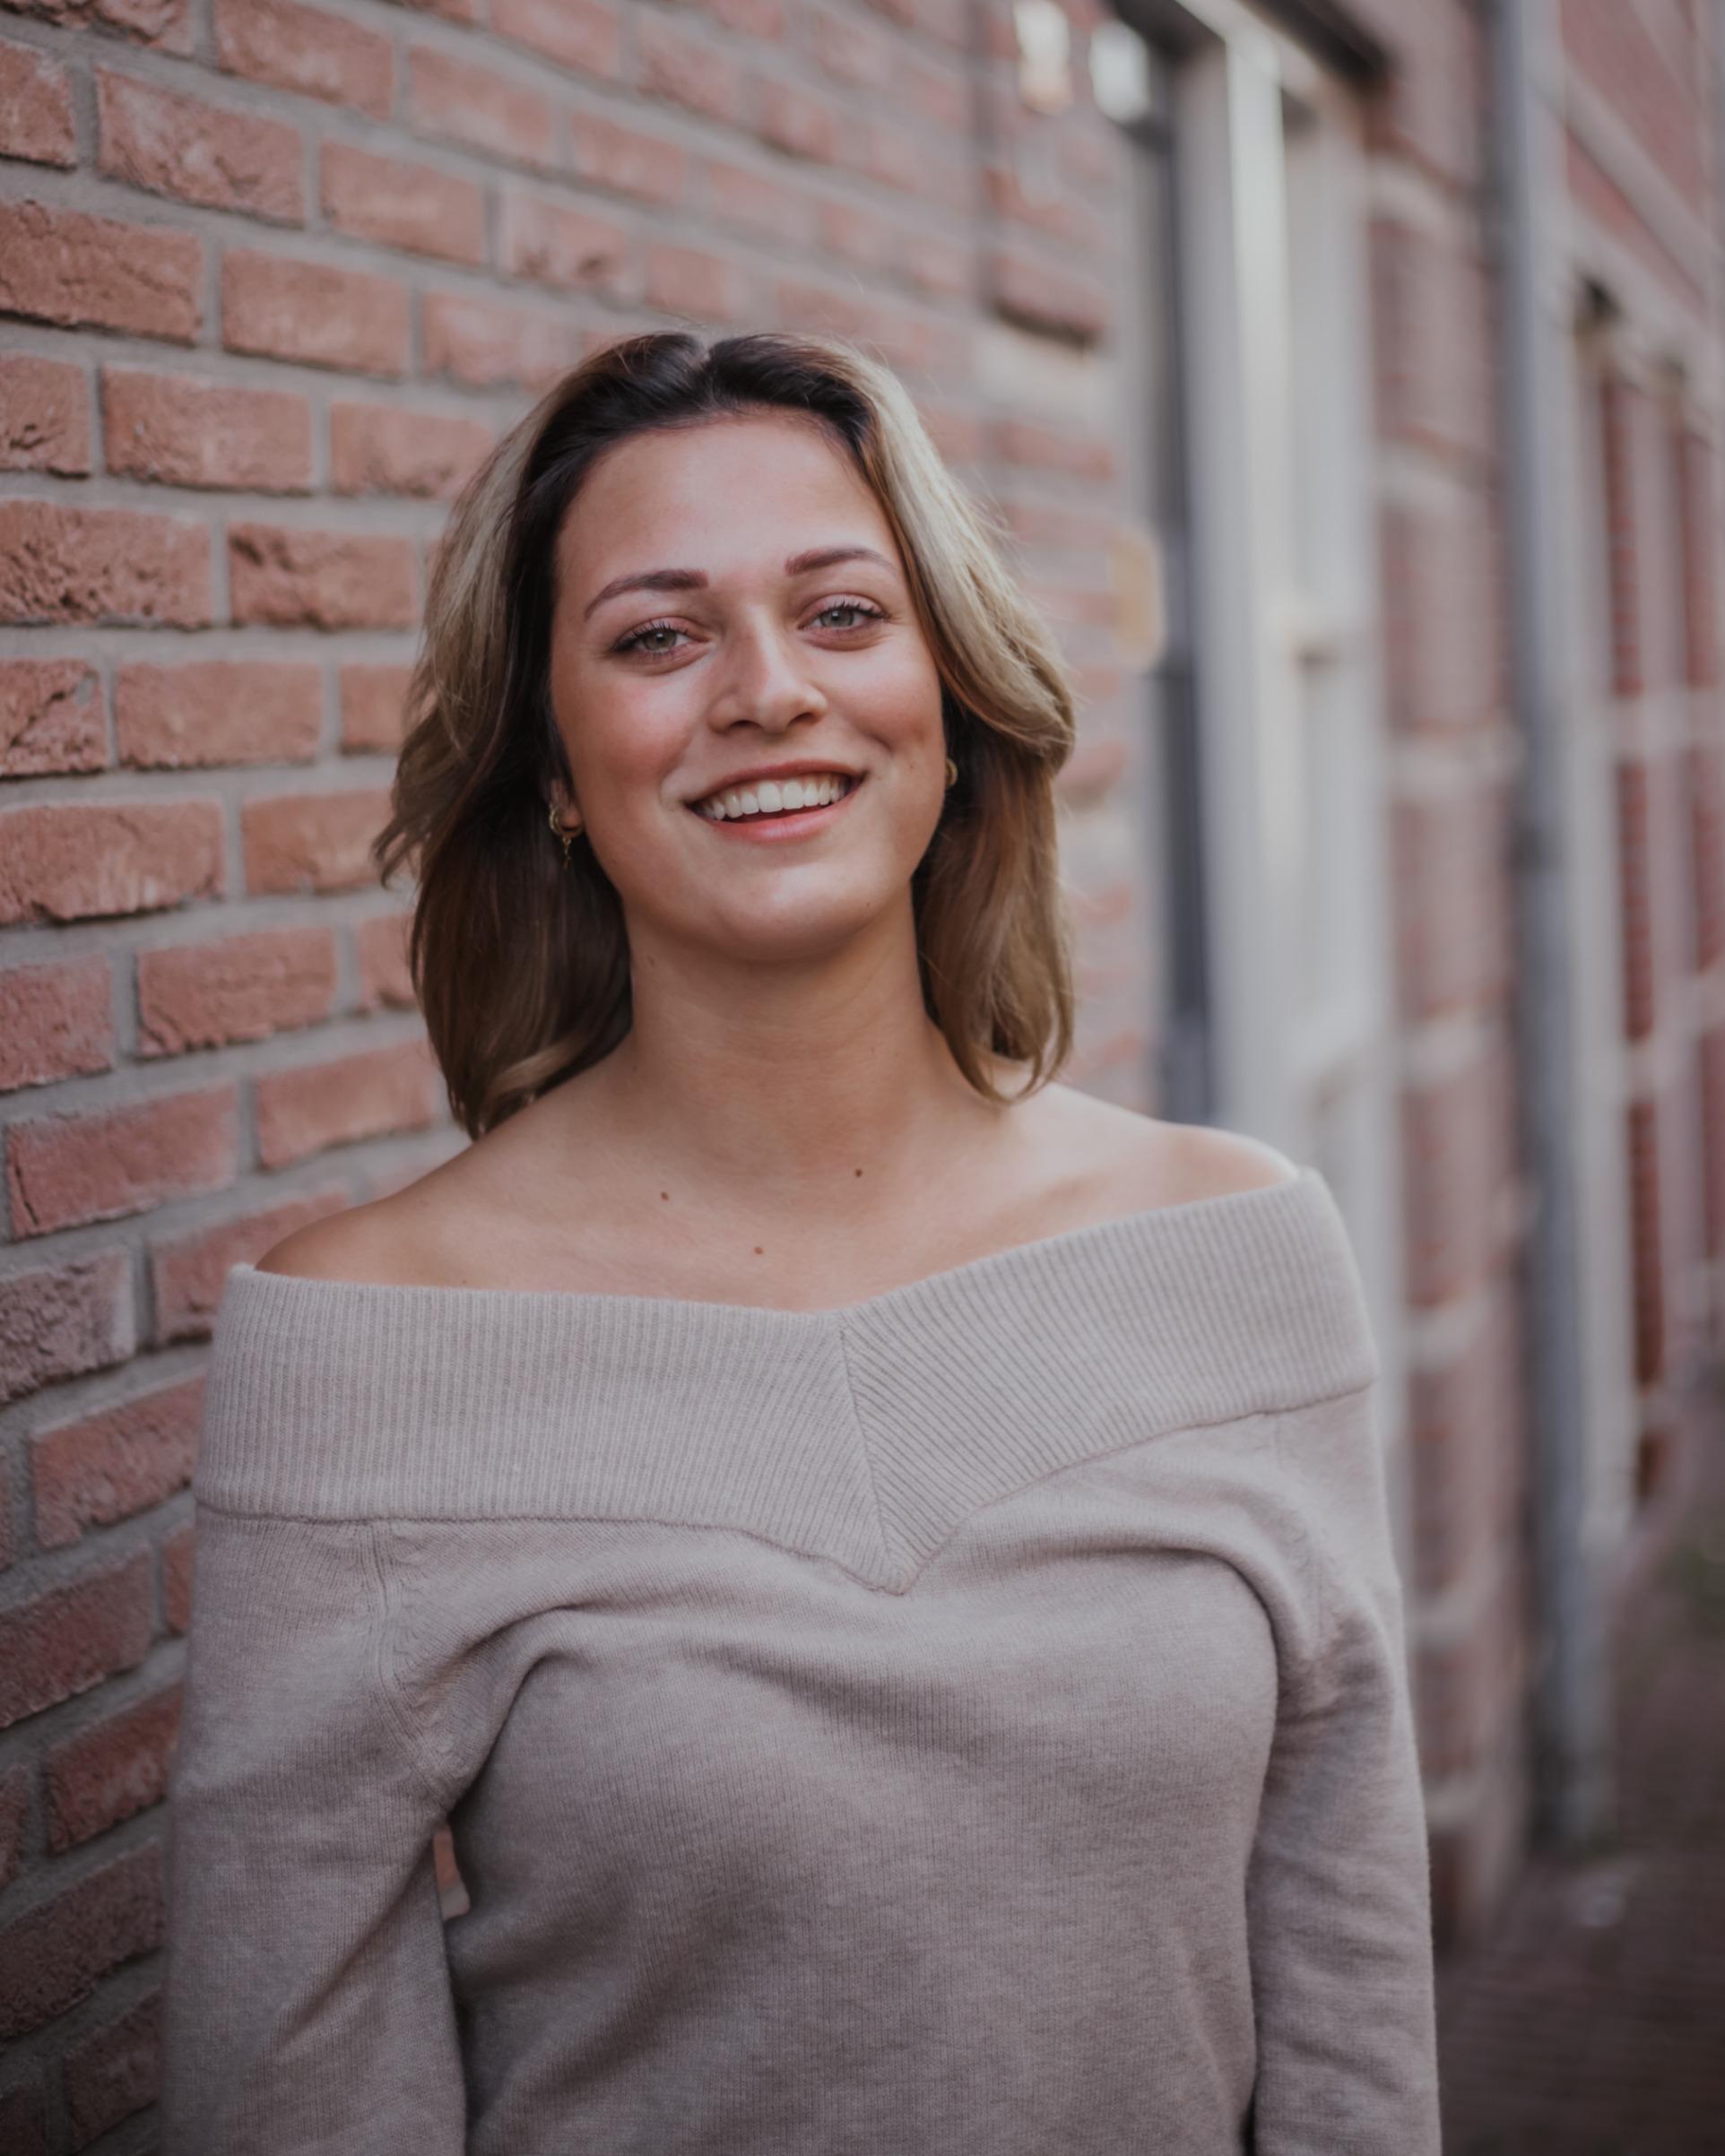 Carina - Kapper bij Inkx Wellness Heemskerk